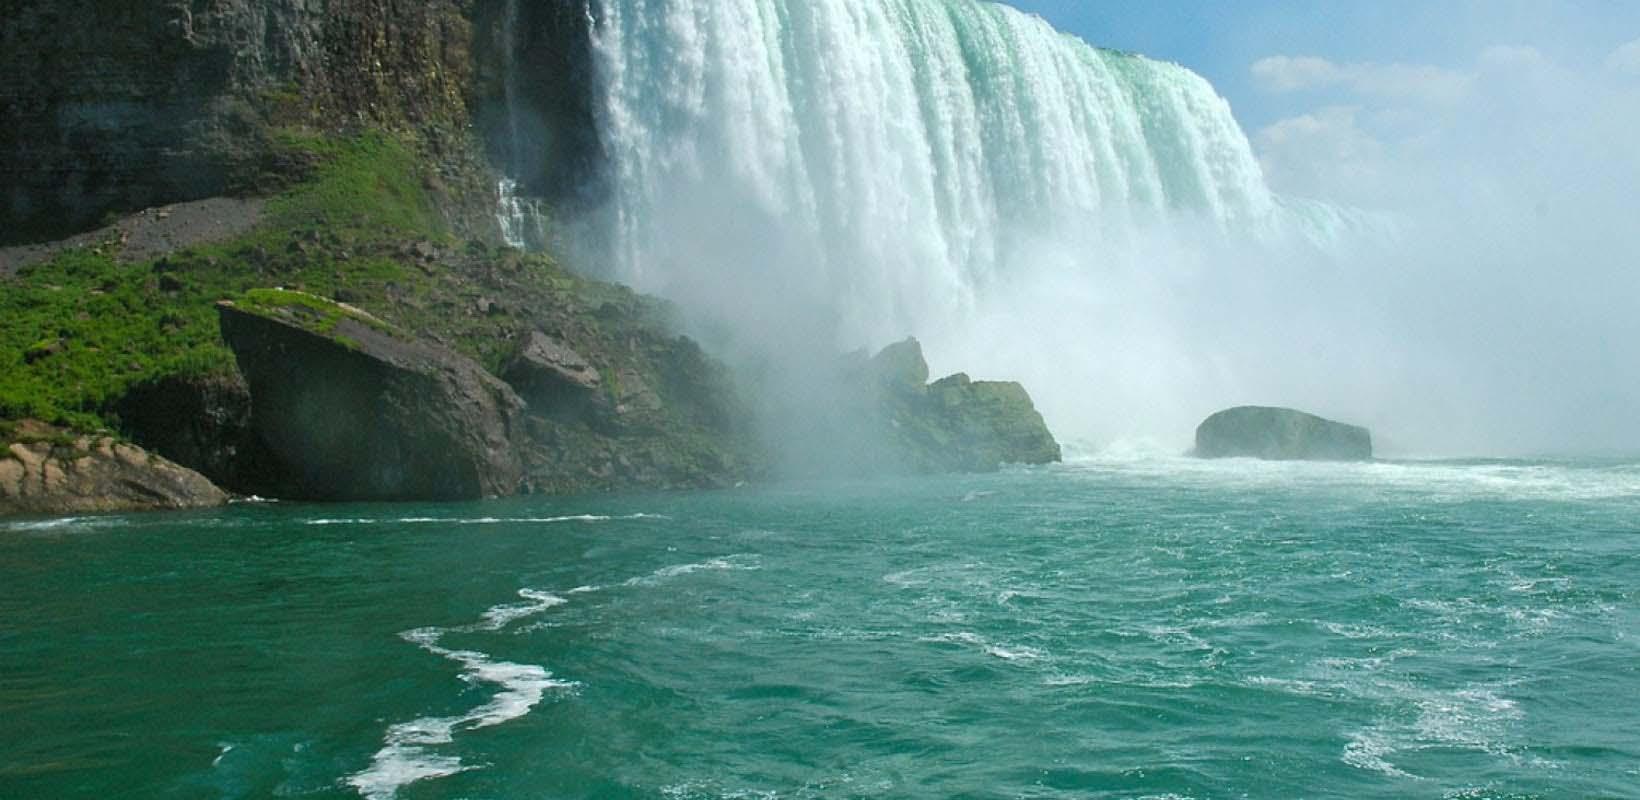 Niagara Falls Maid in America Tour